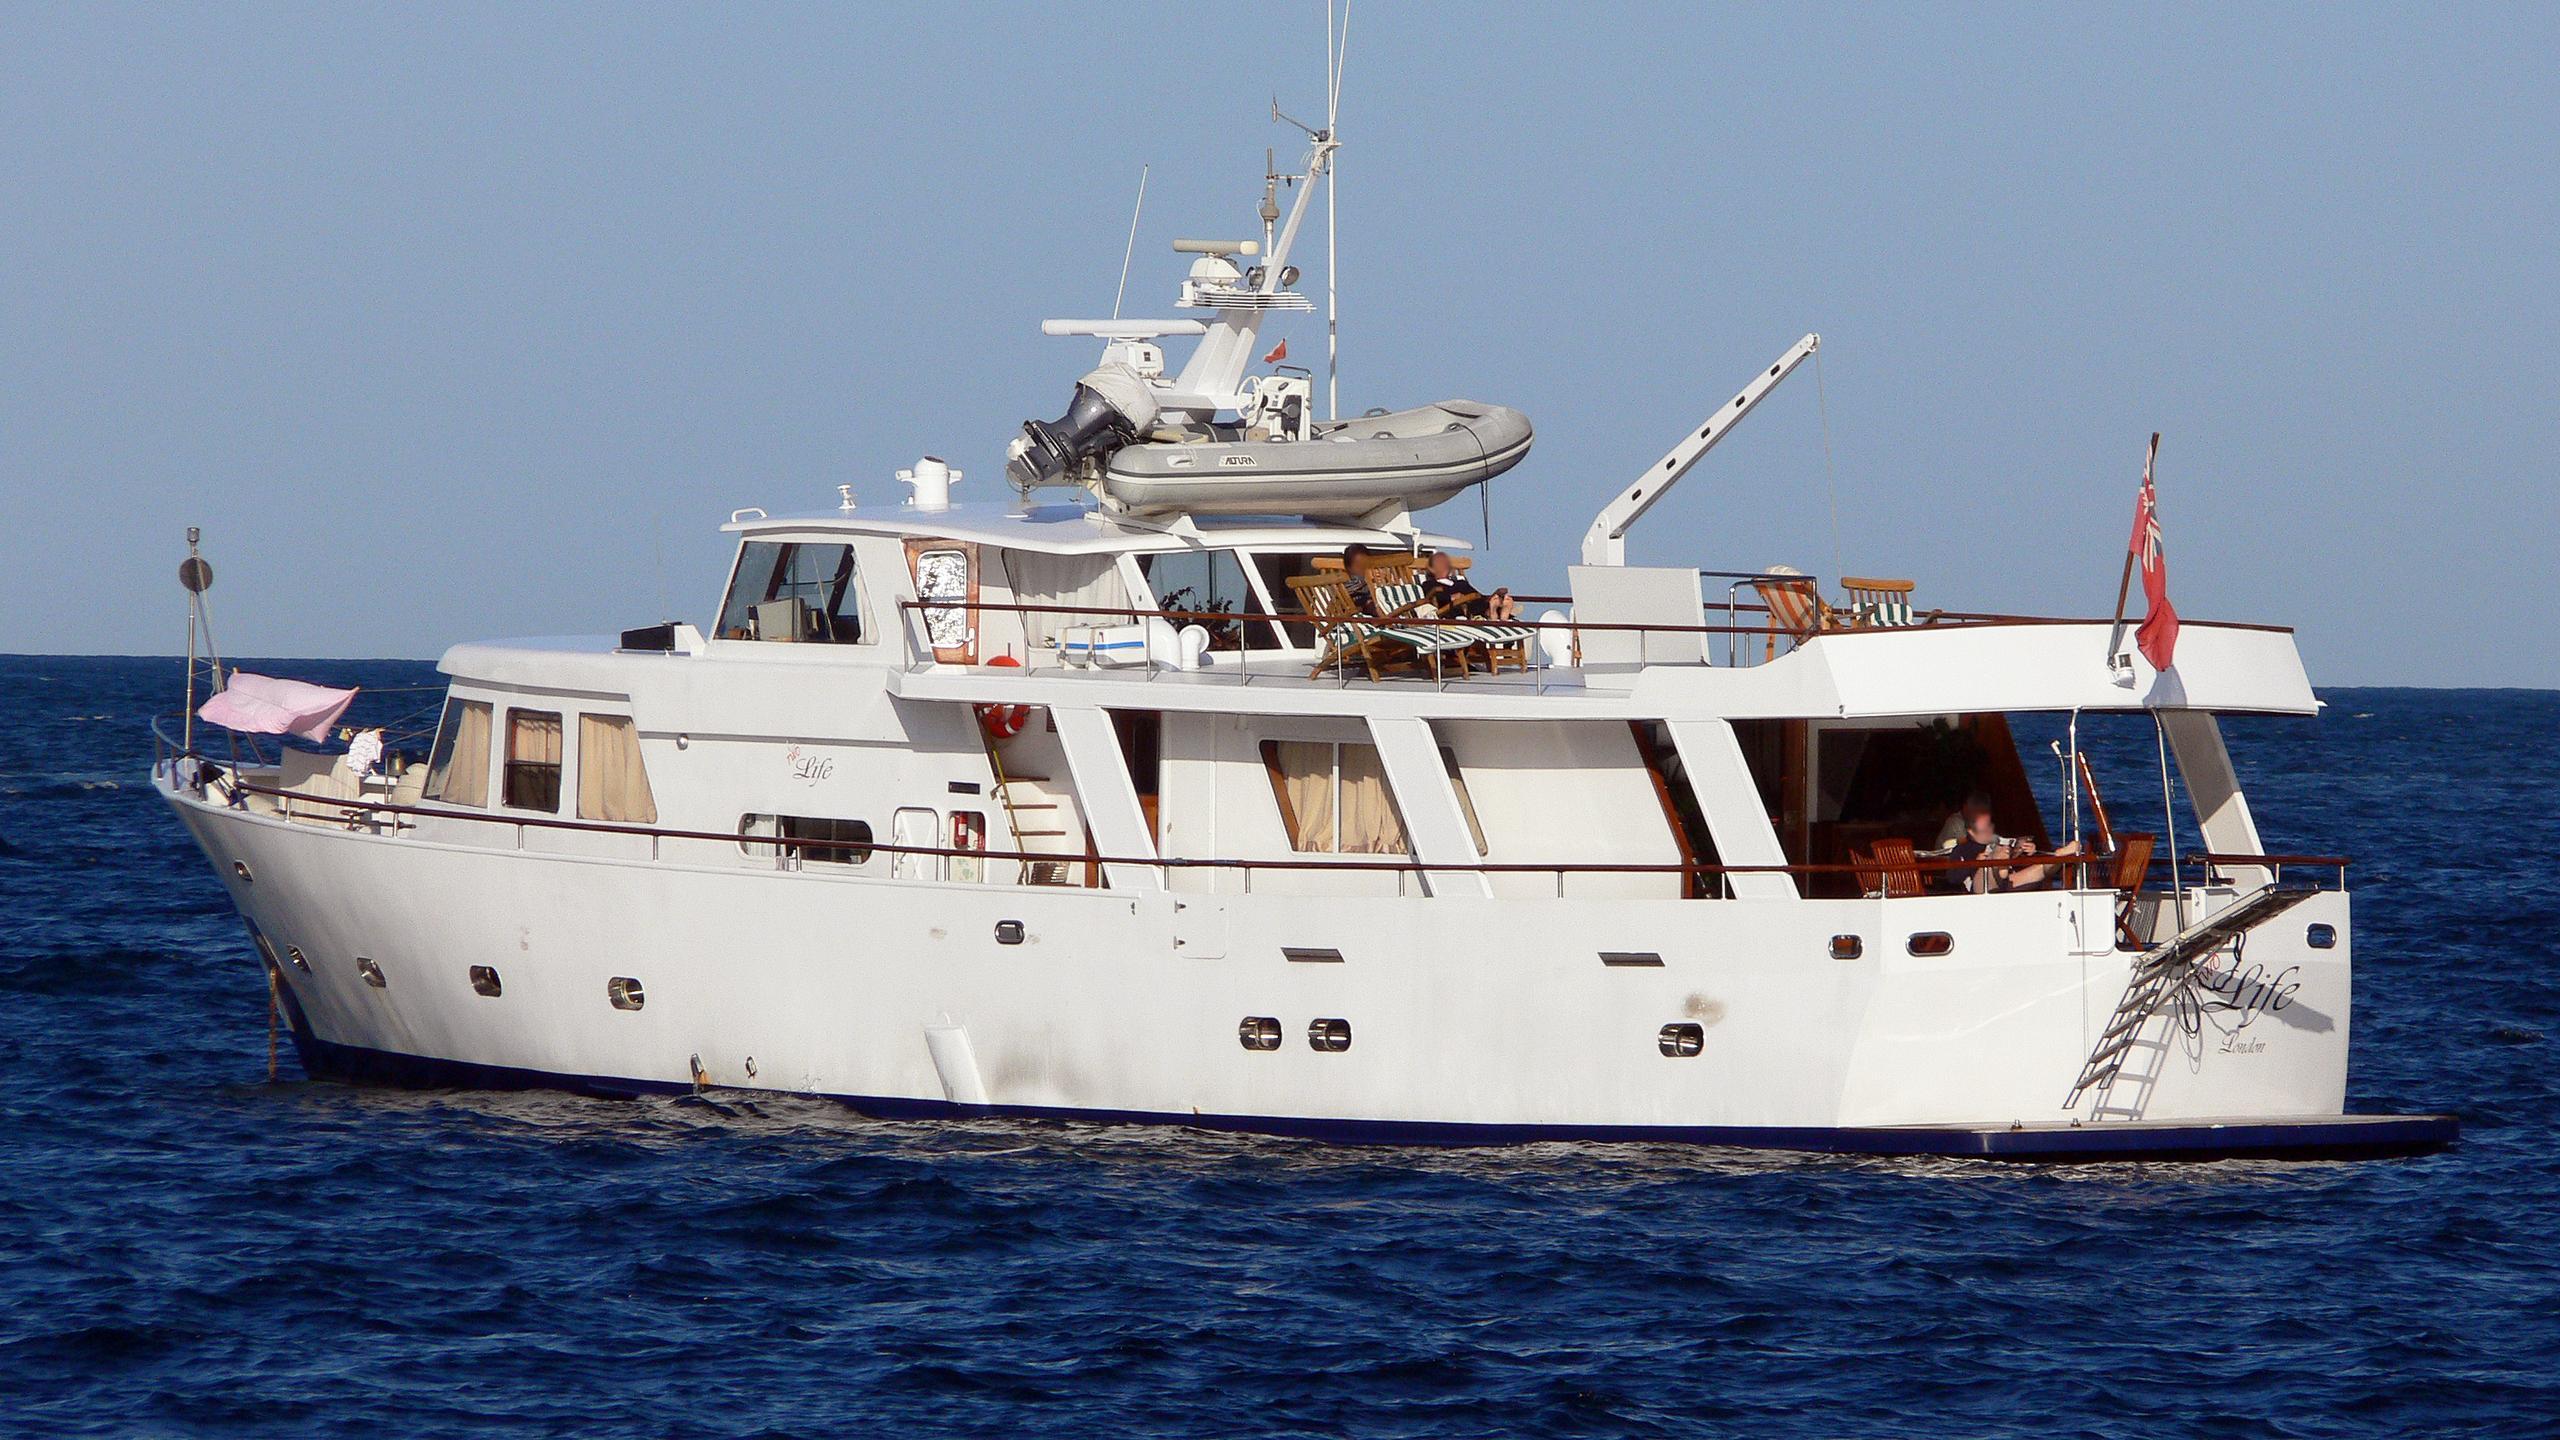 life-motor-yacht-van-den-beldt-1962-28m-rear-profile